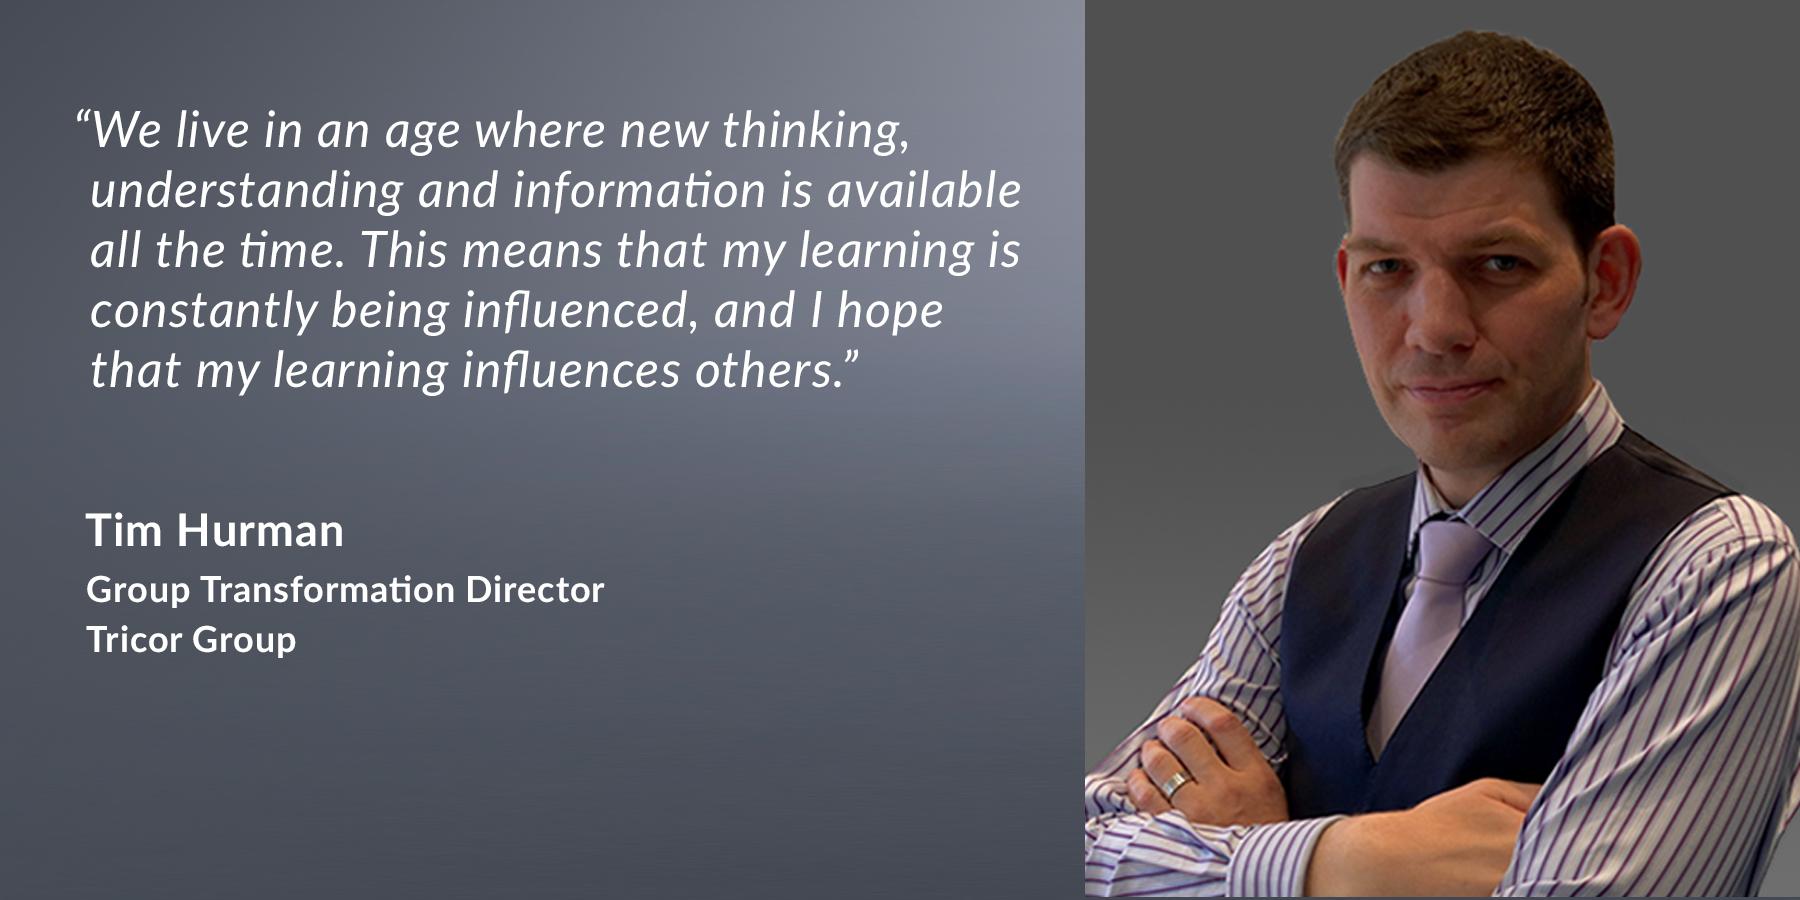 Tim Hurman - Group Transformation Director